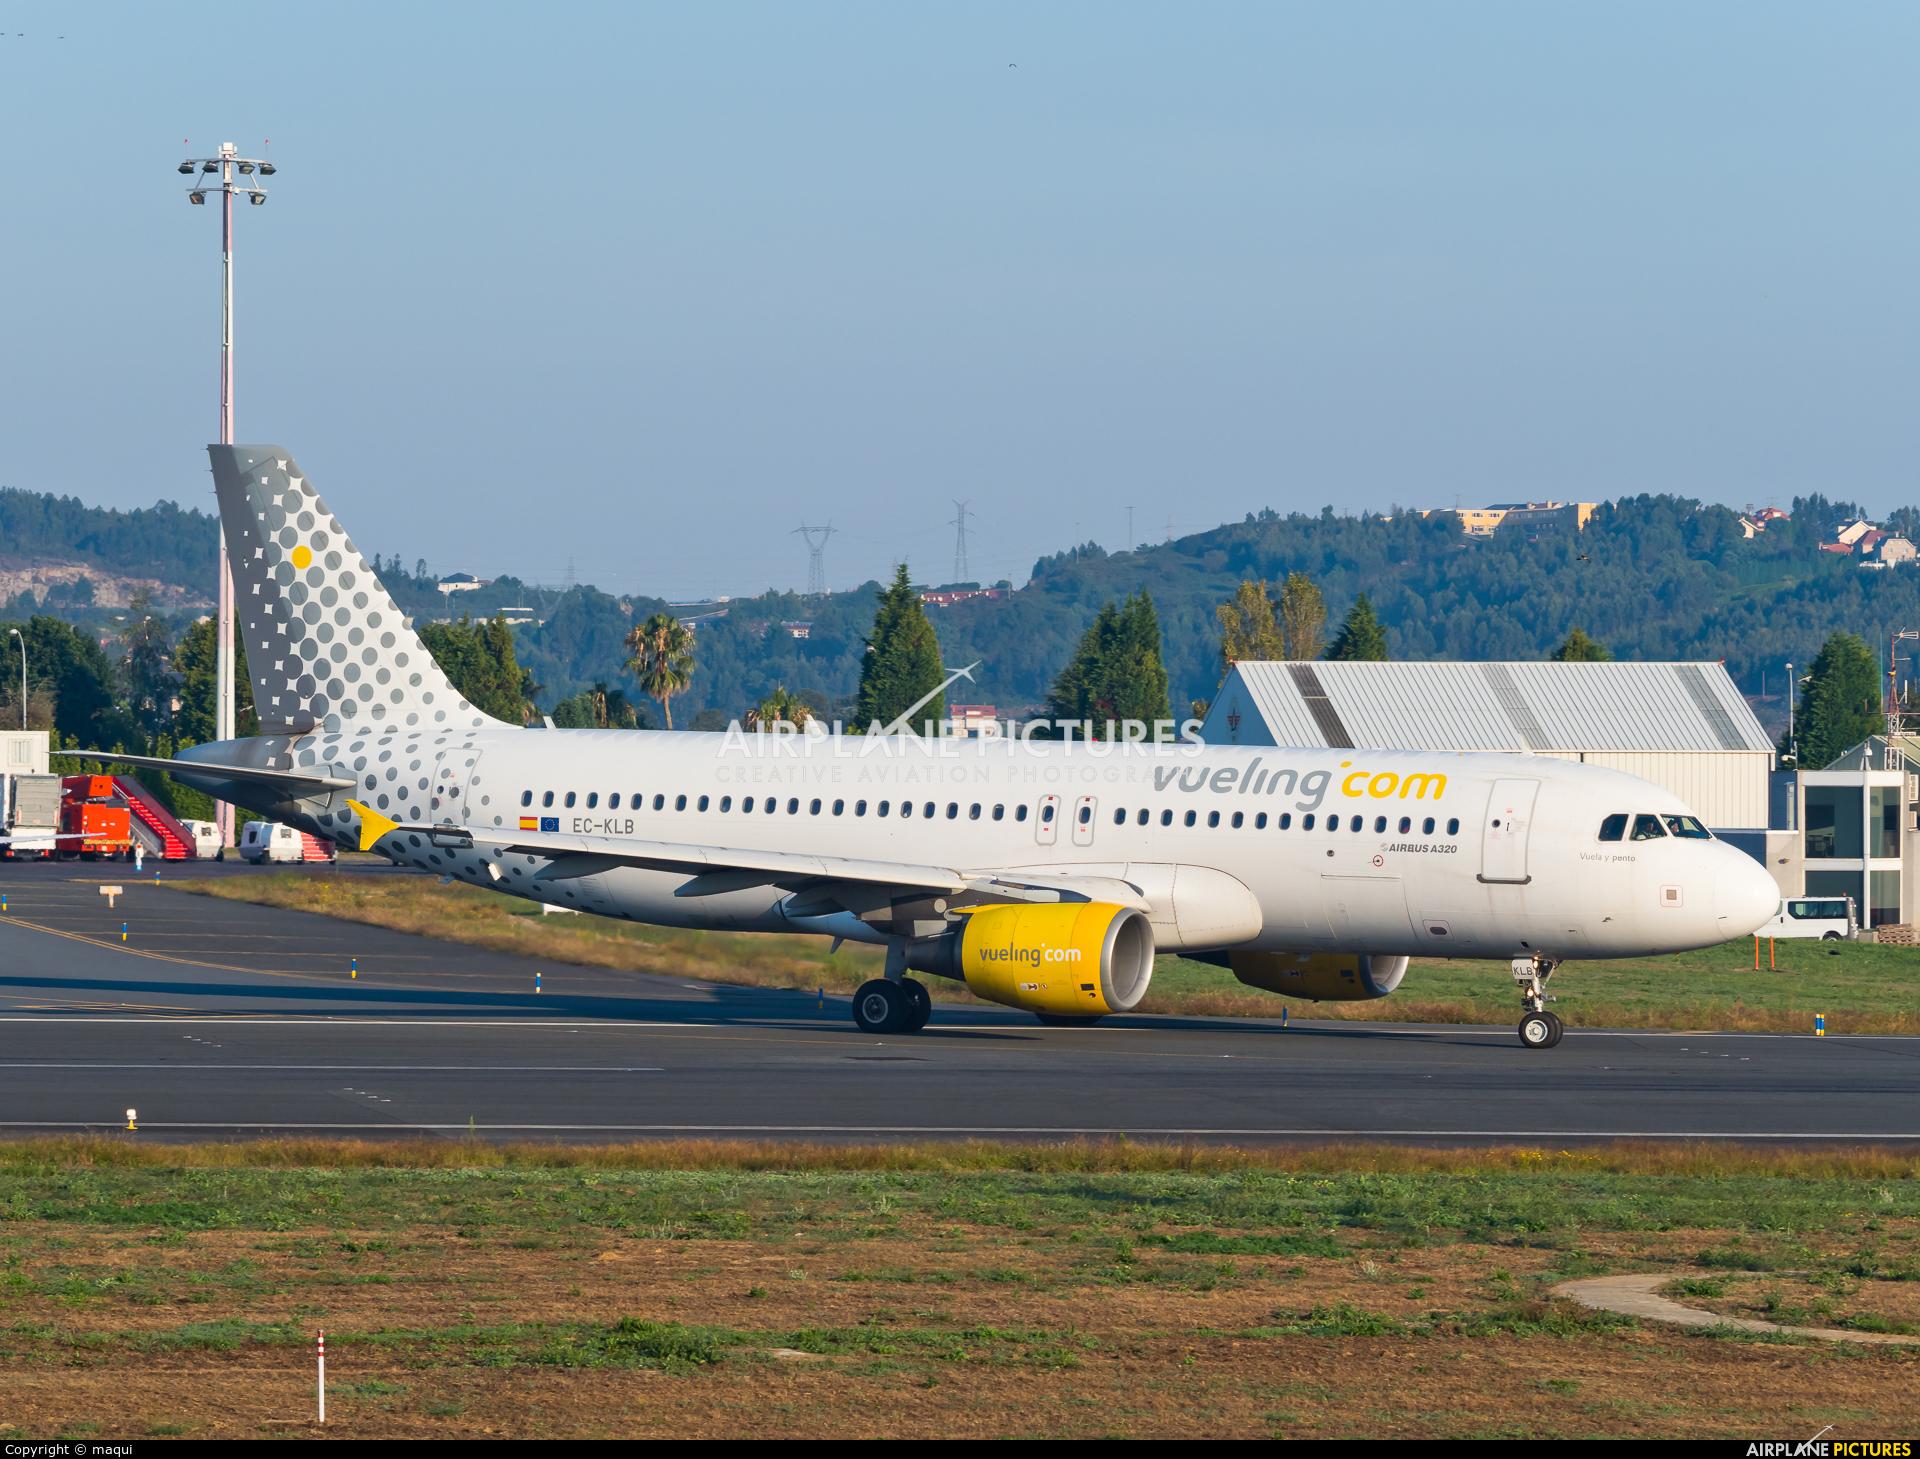 Vueling Airlines EC-KLB aircraft at La Coruña